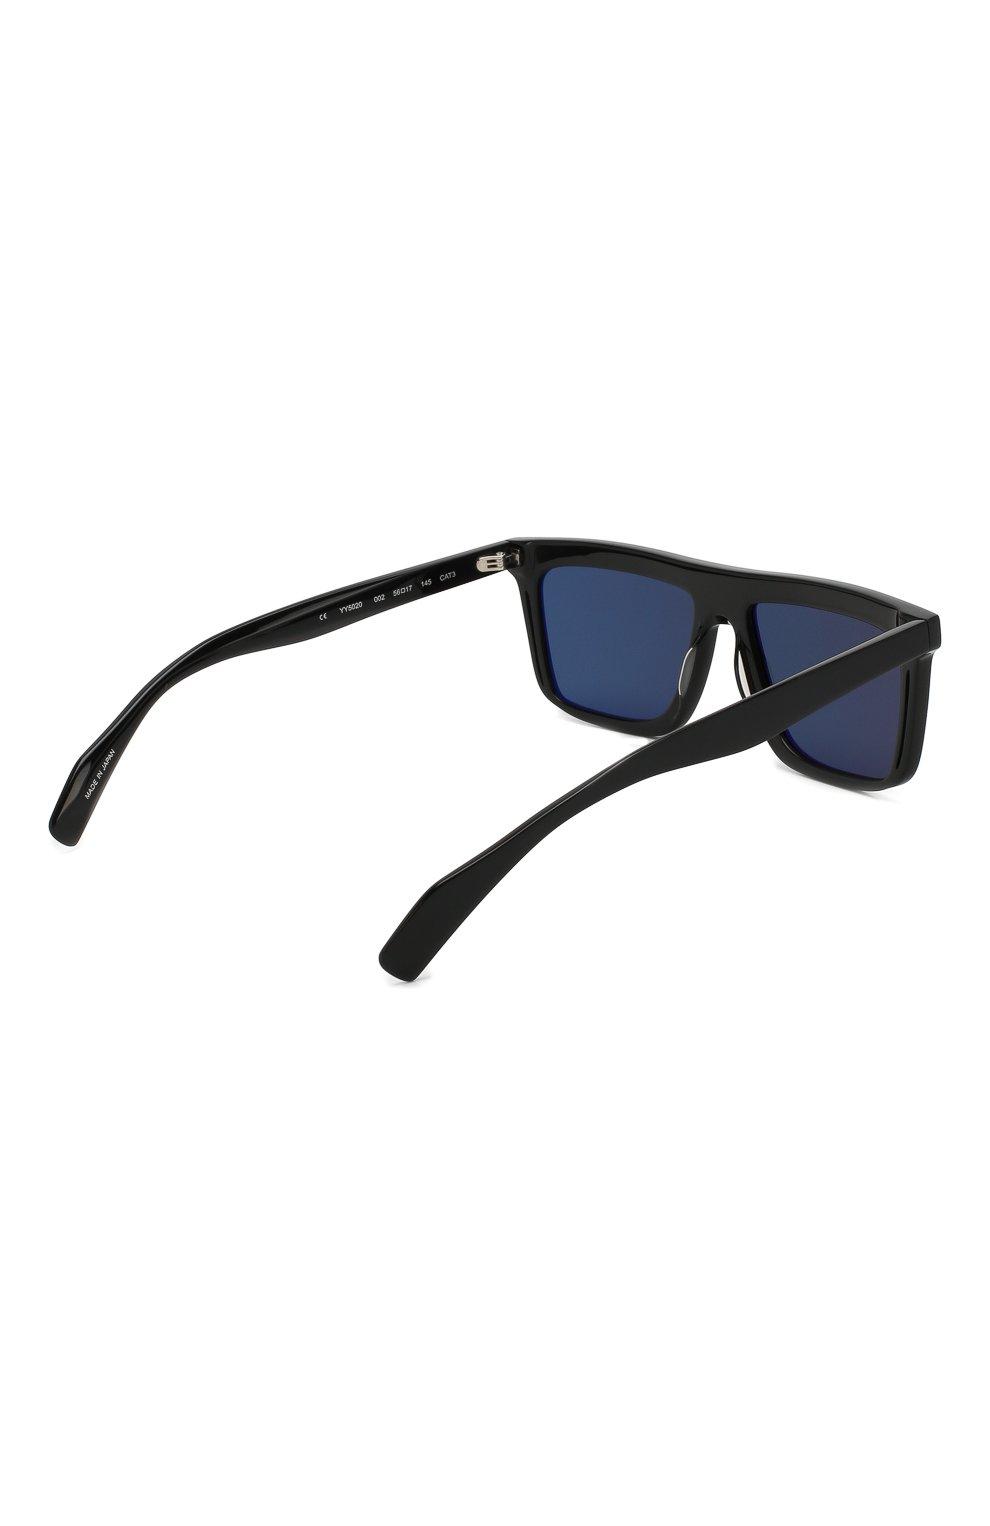 Мужские солнцезащитные очки YOHJI YAMAMOTO черного цвета, арт. YY5020 002 | Фото 3